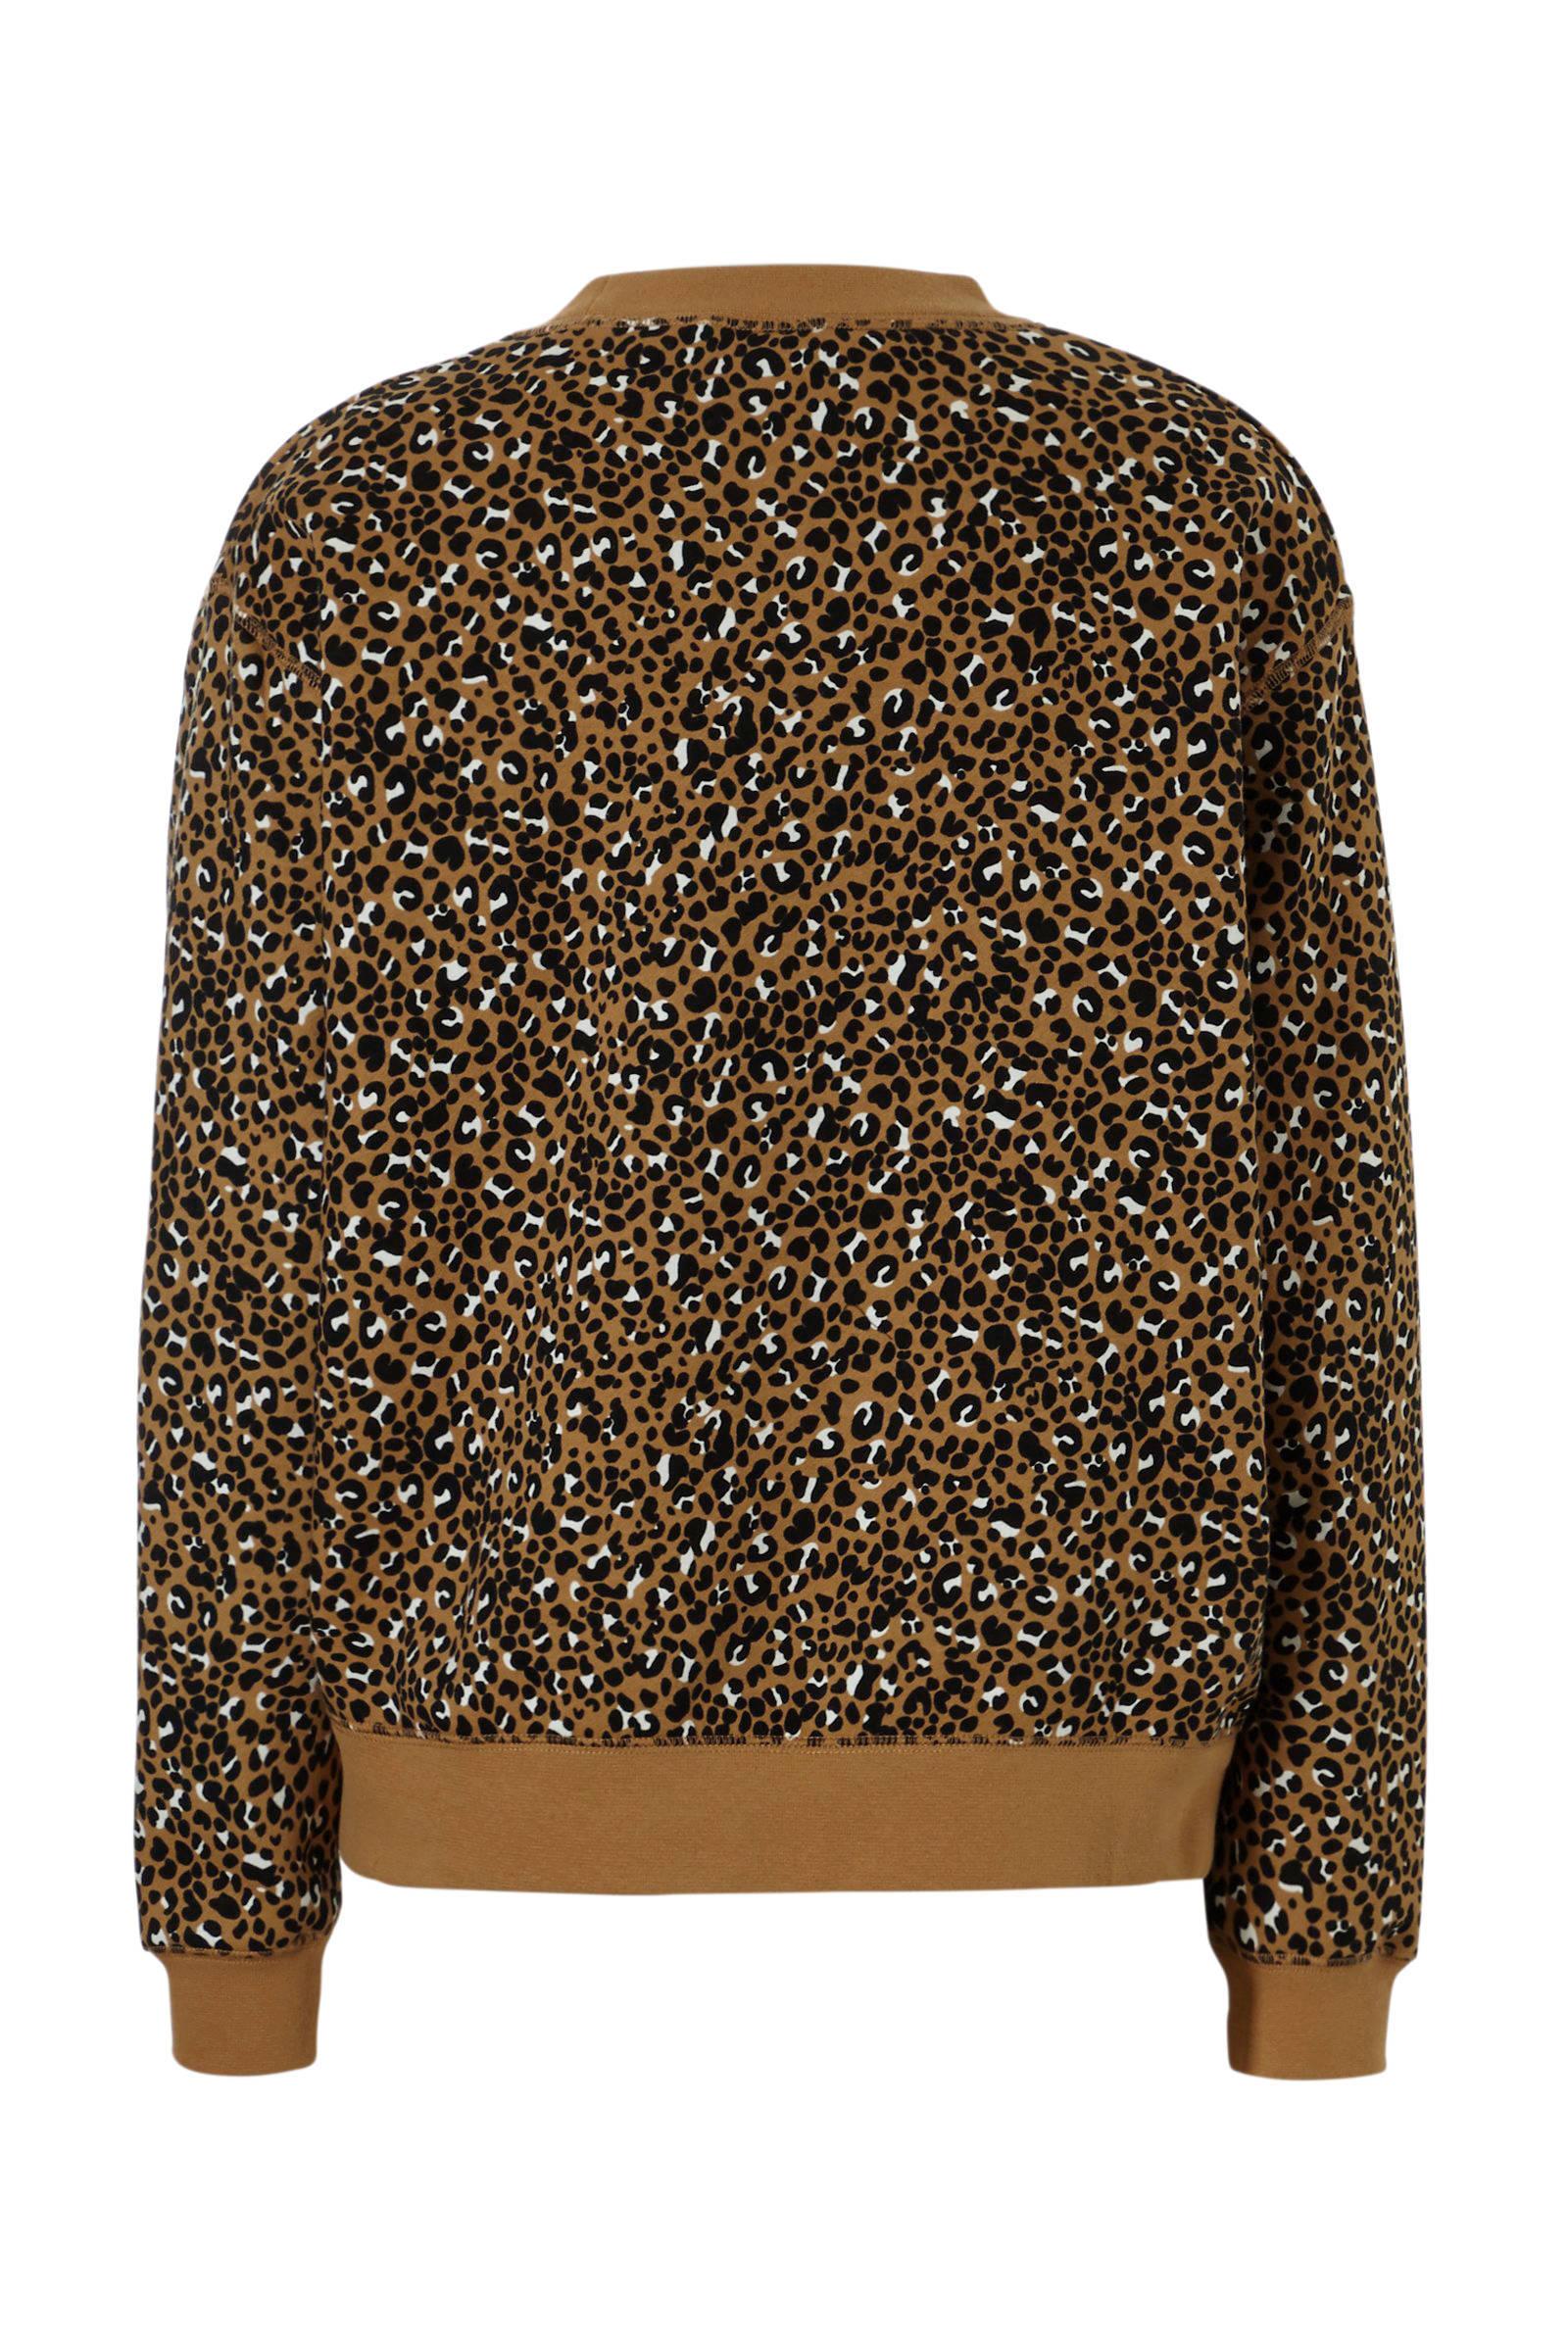 Nike sweater met all over panterprint okergeel | wehkamp